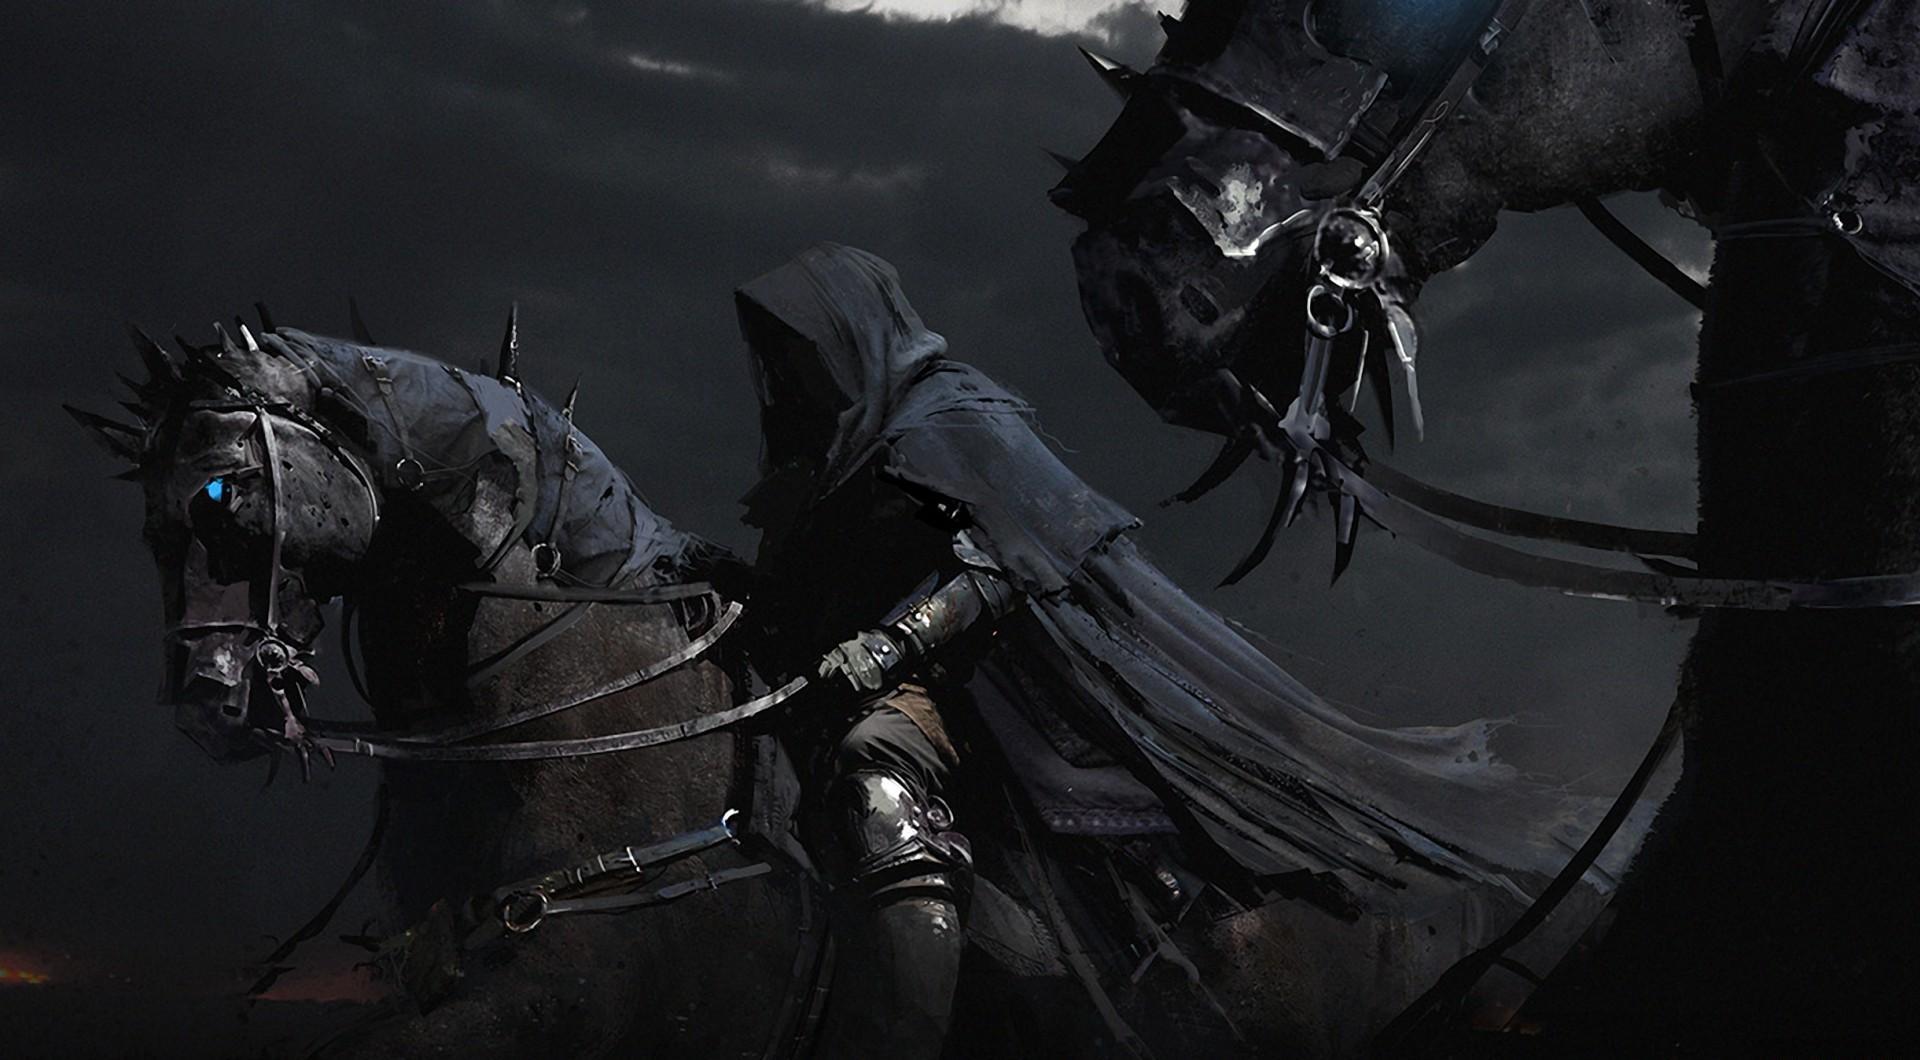 horses horsemen black night cloak